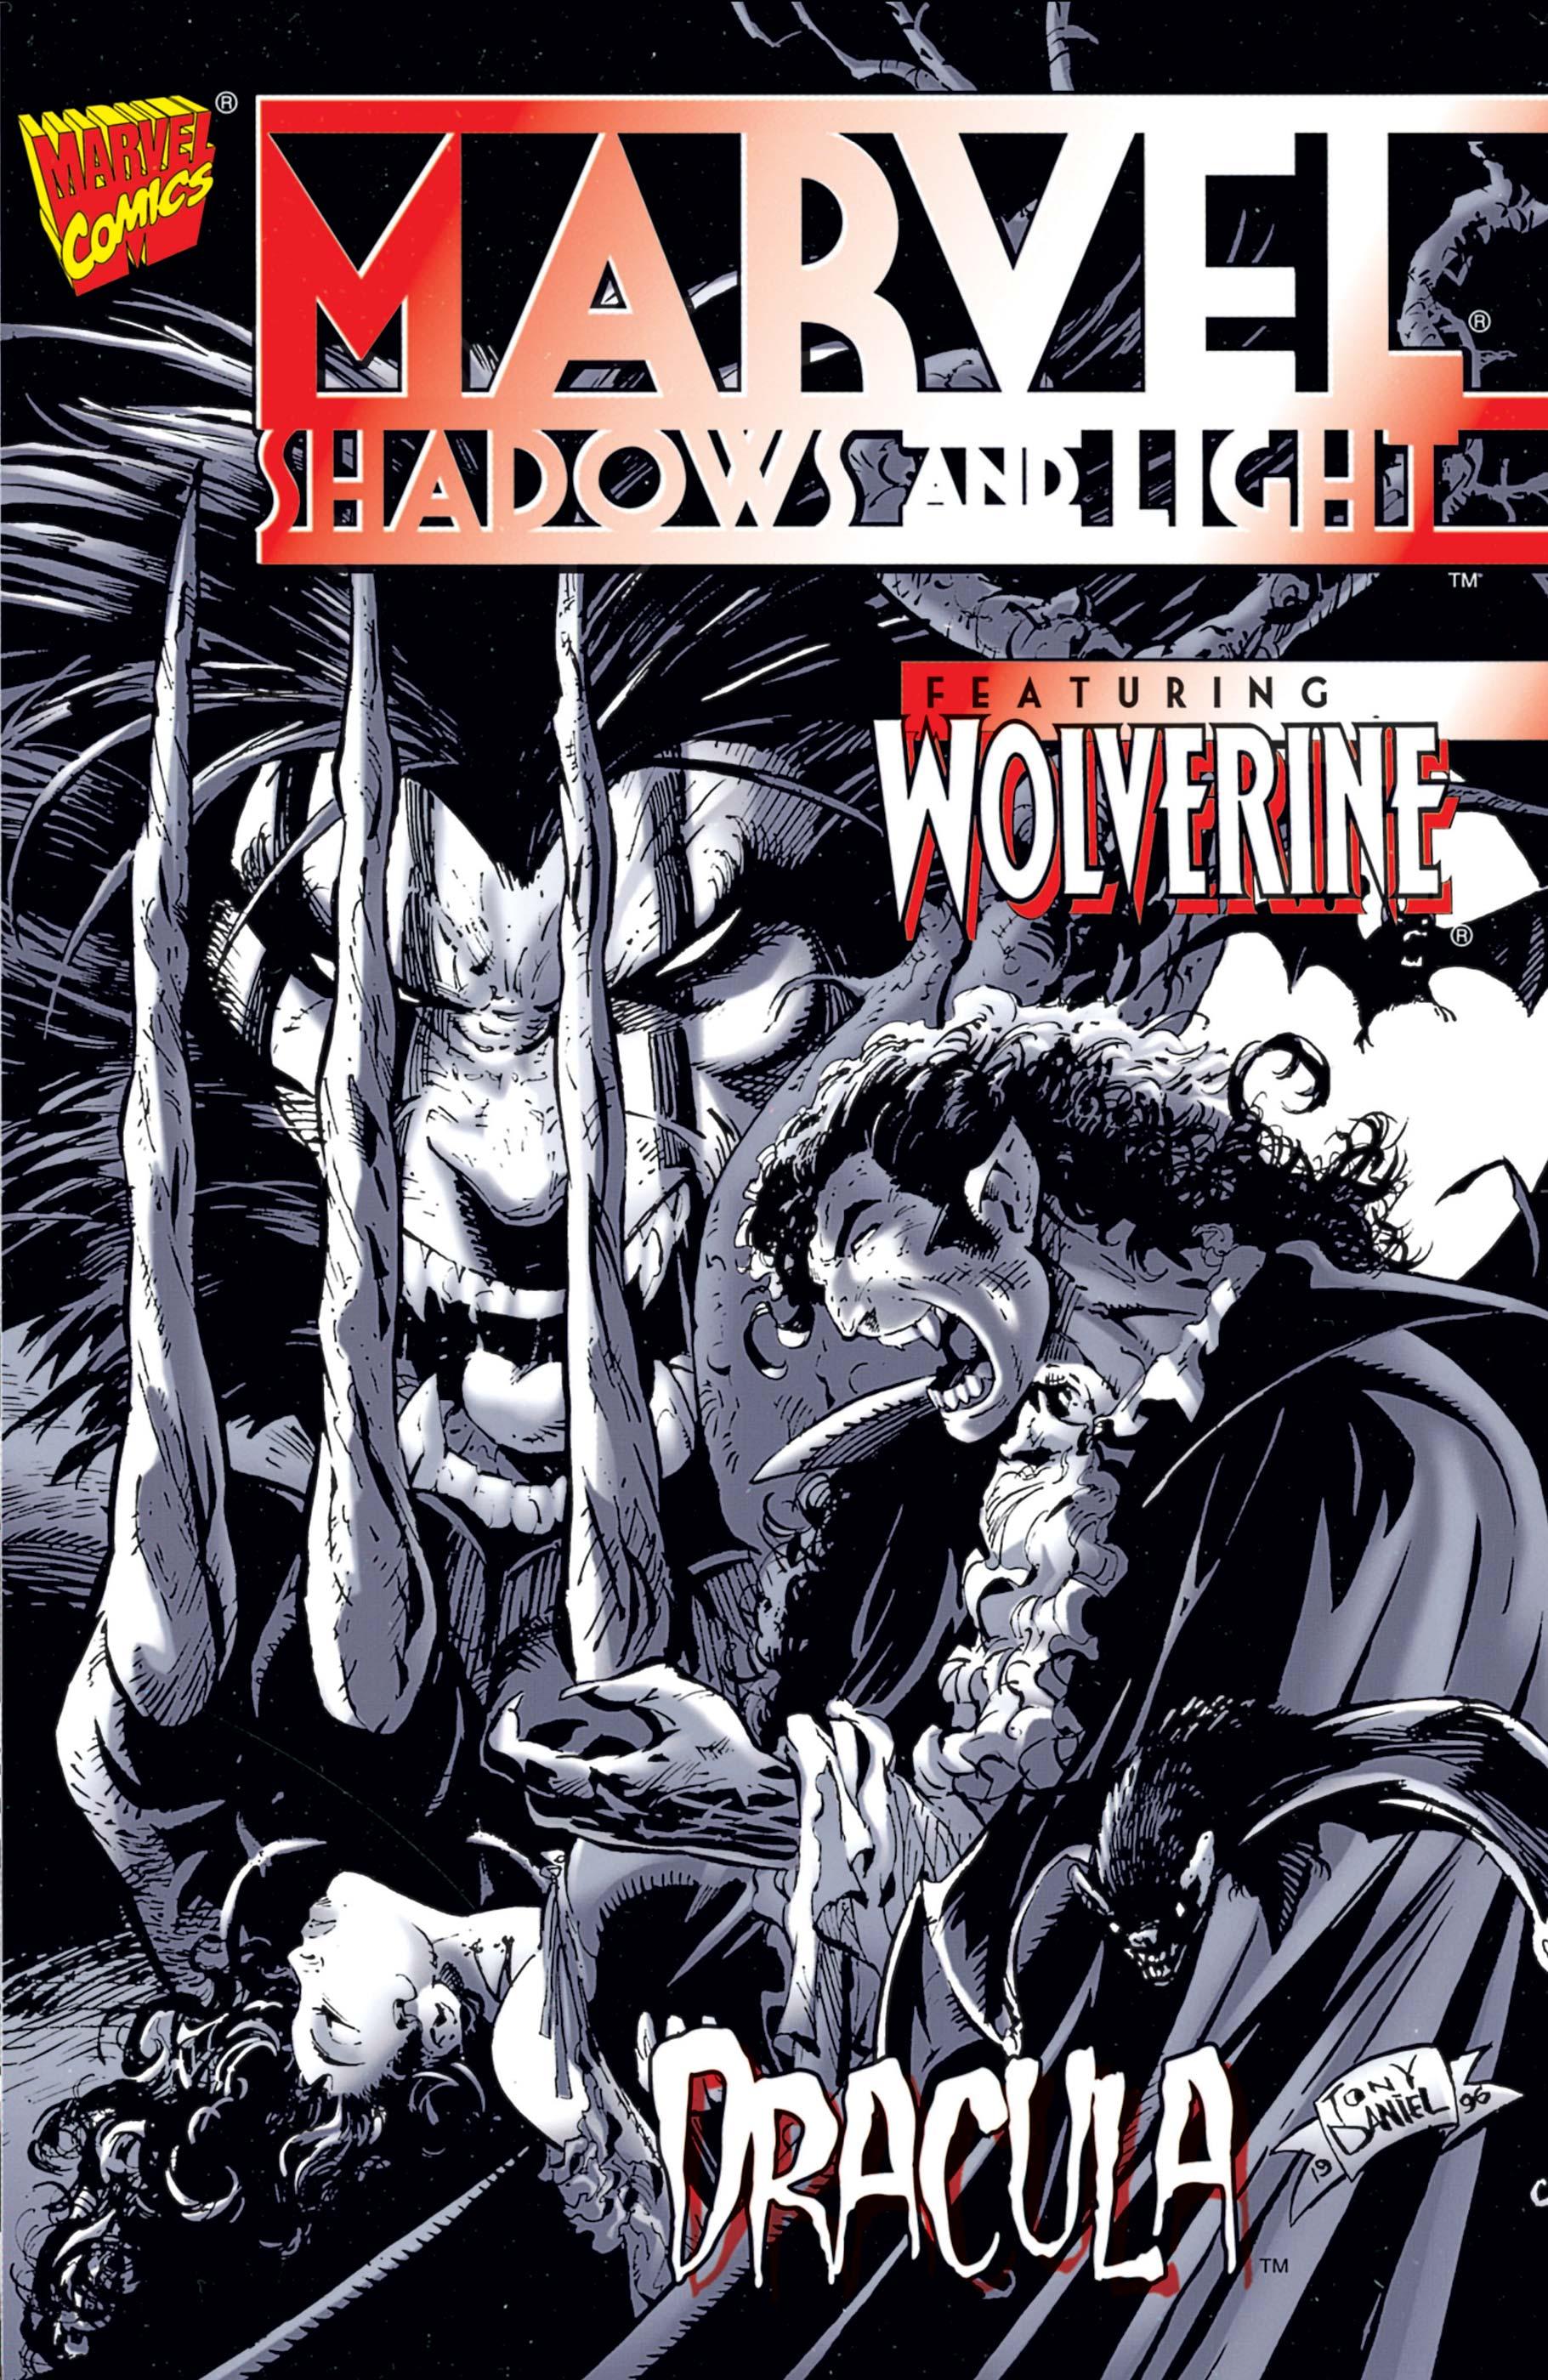 Marvel Shadows and Light (1996) #1